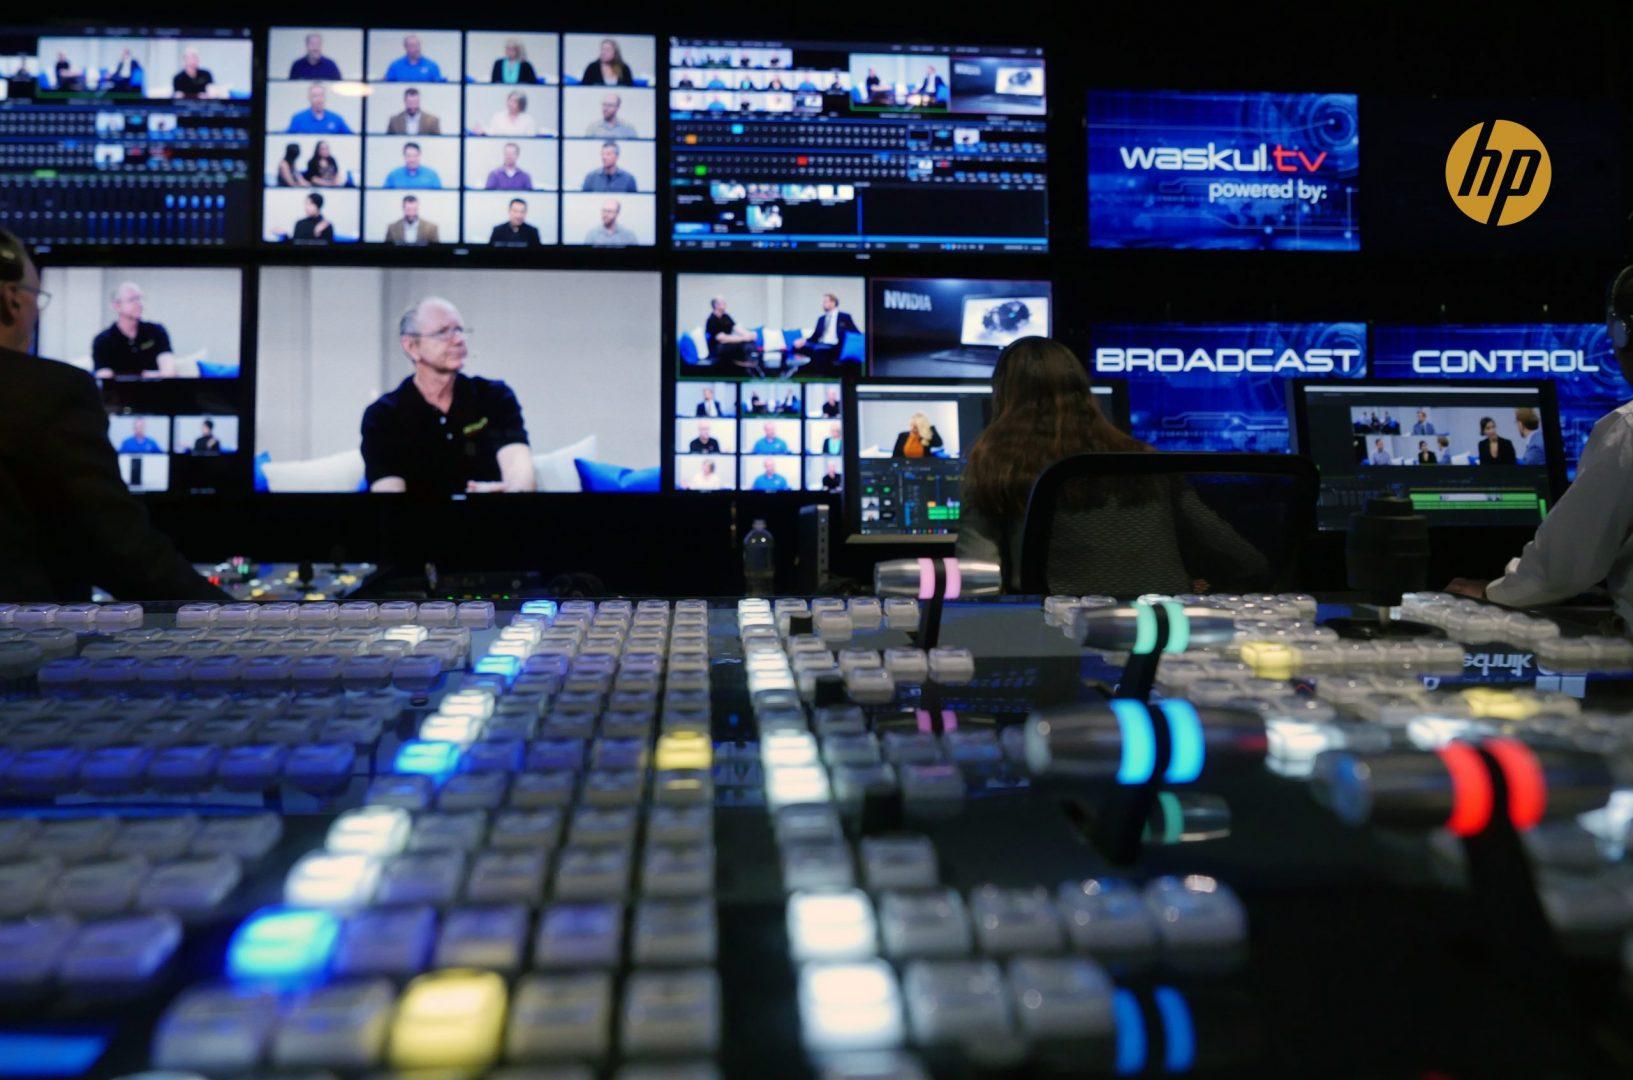 Waskul.TV StudioXperience Broadcast Control at 2017 NAB Show